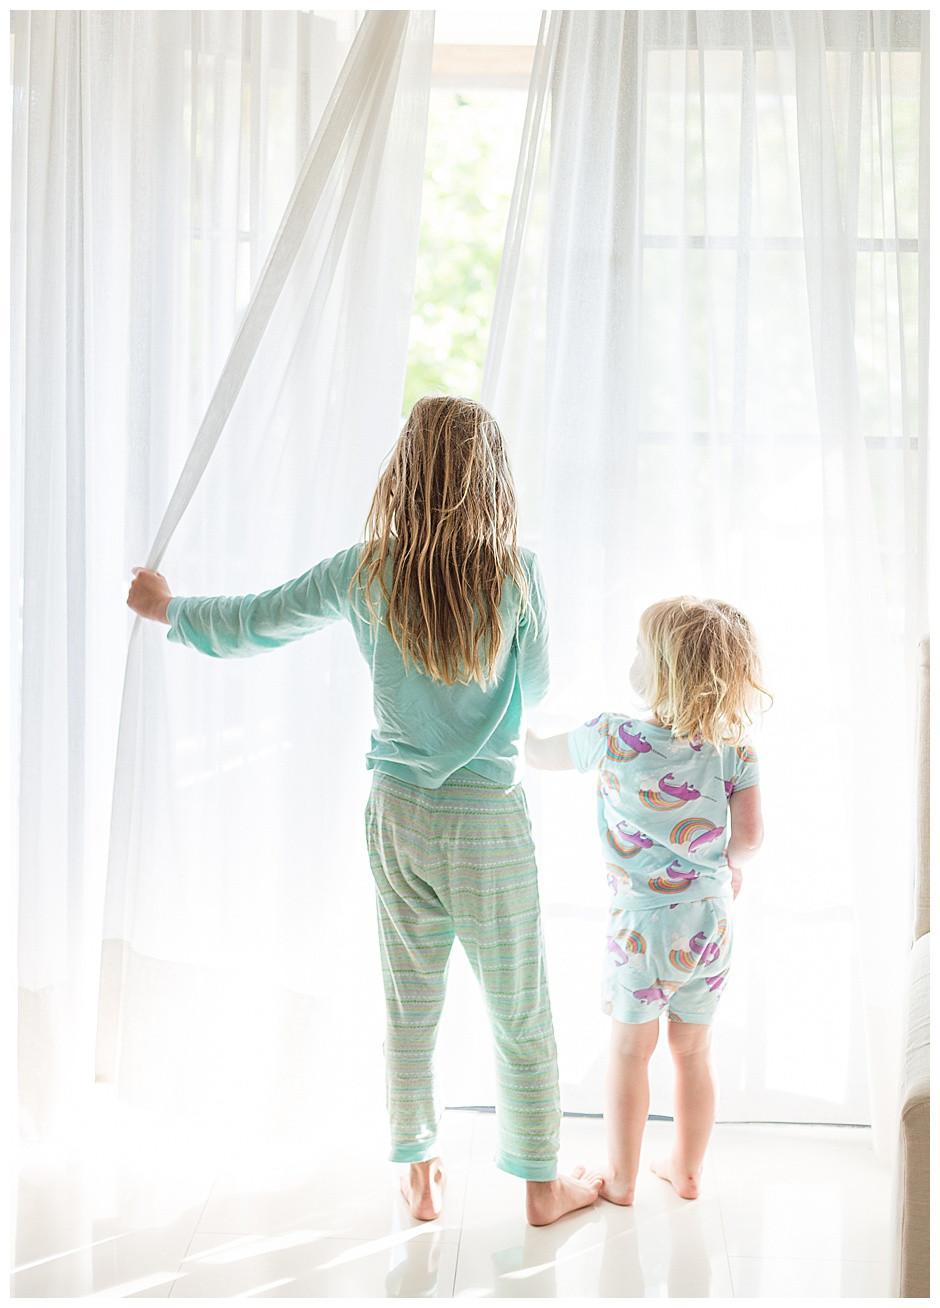 lifestyle photography chattanooga, studio photographer chattanooga, blonde children, white curtains